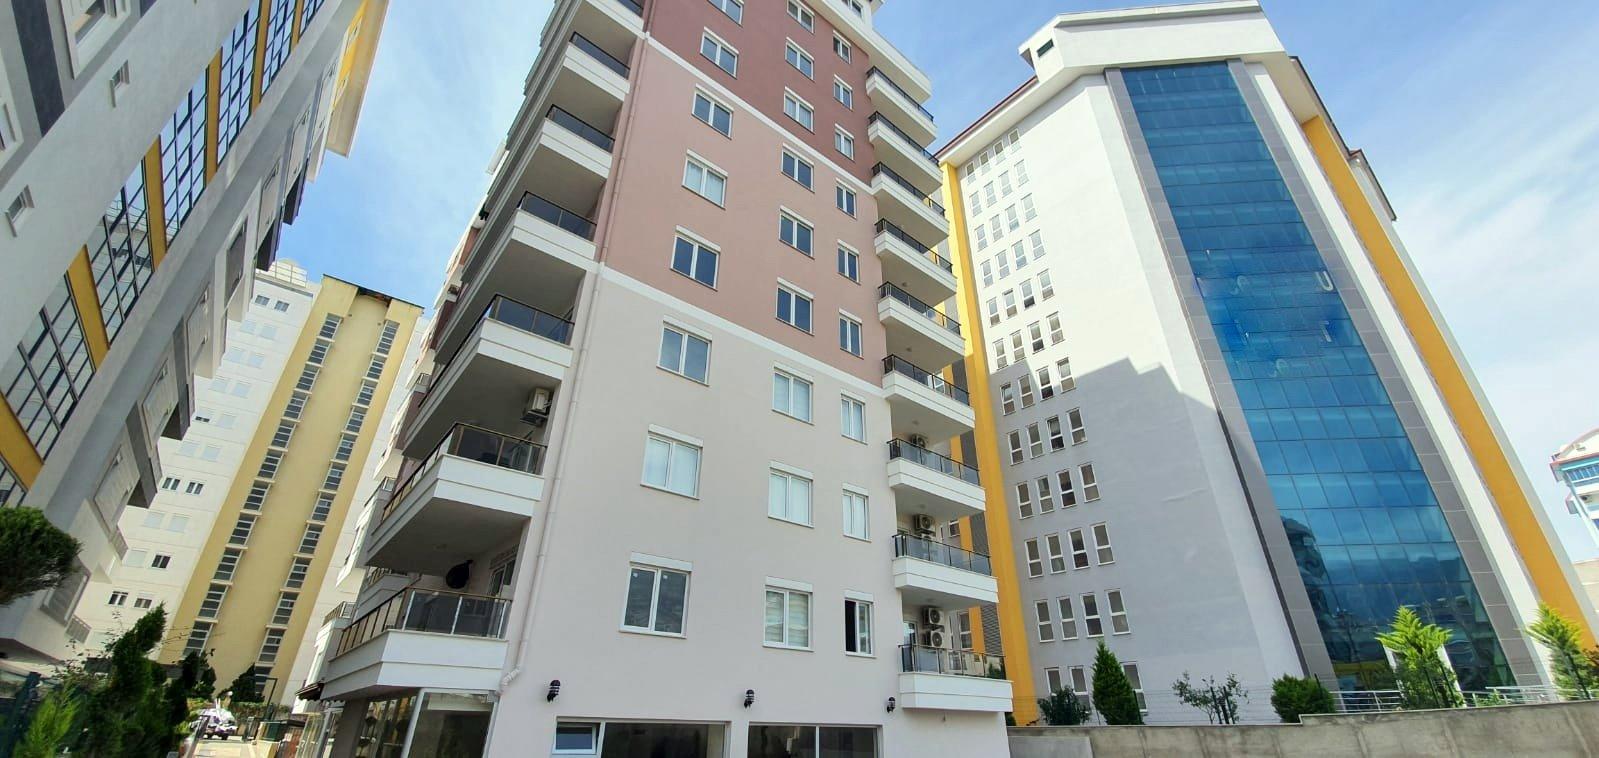 Алания Махмутлар Продажа Квартиры 2+1 Вблизи от Моря